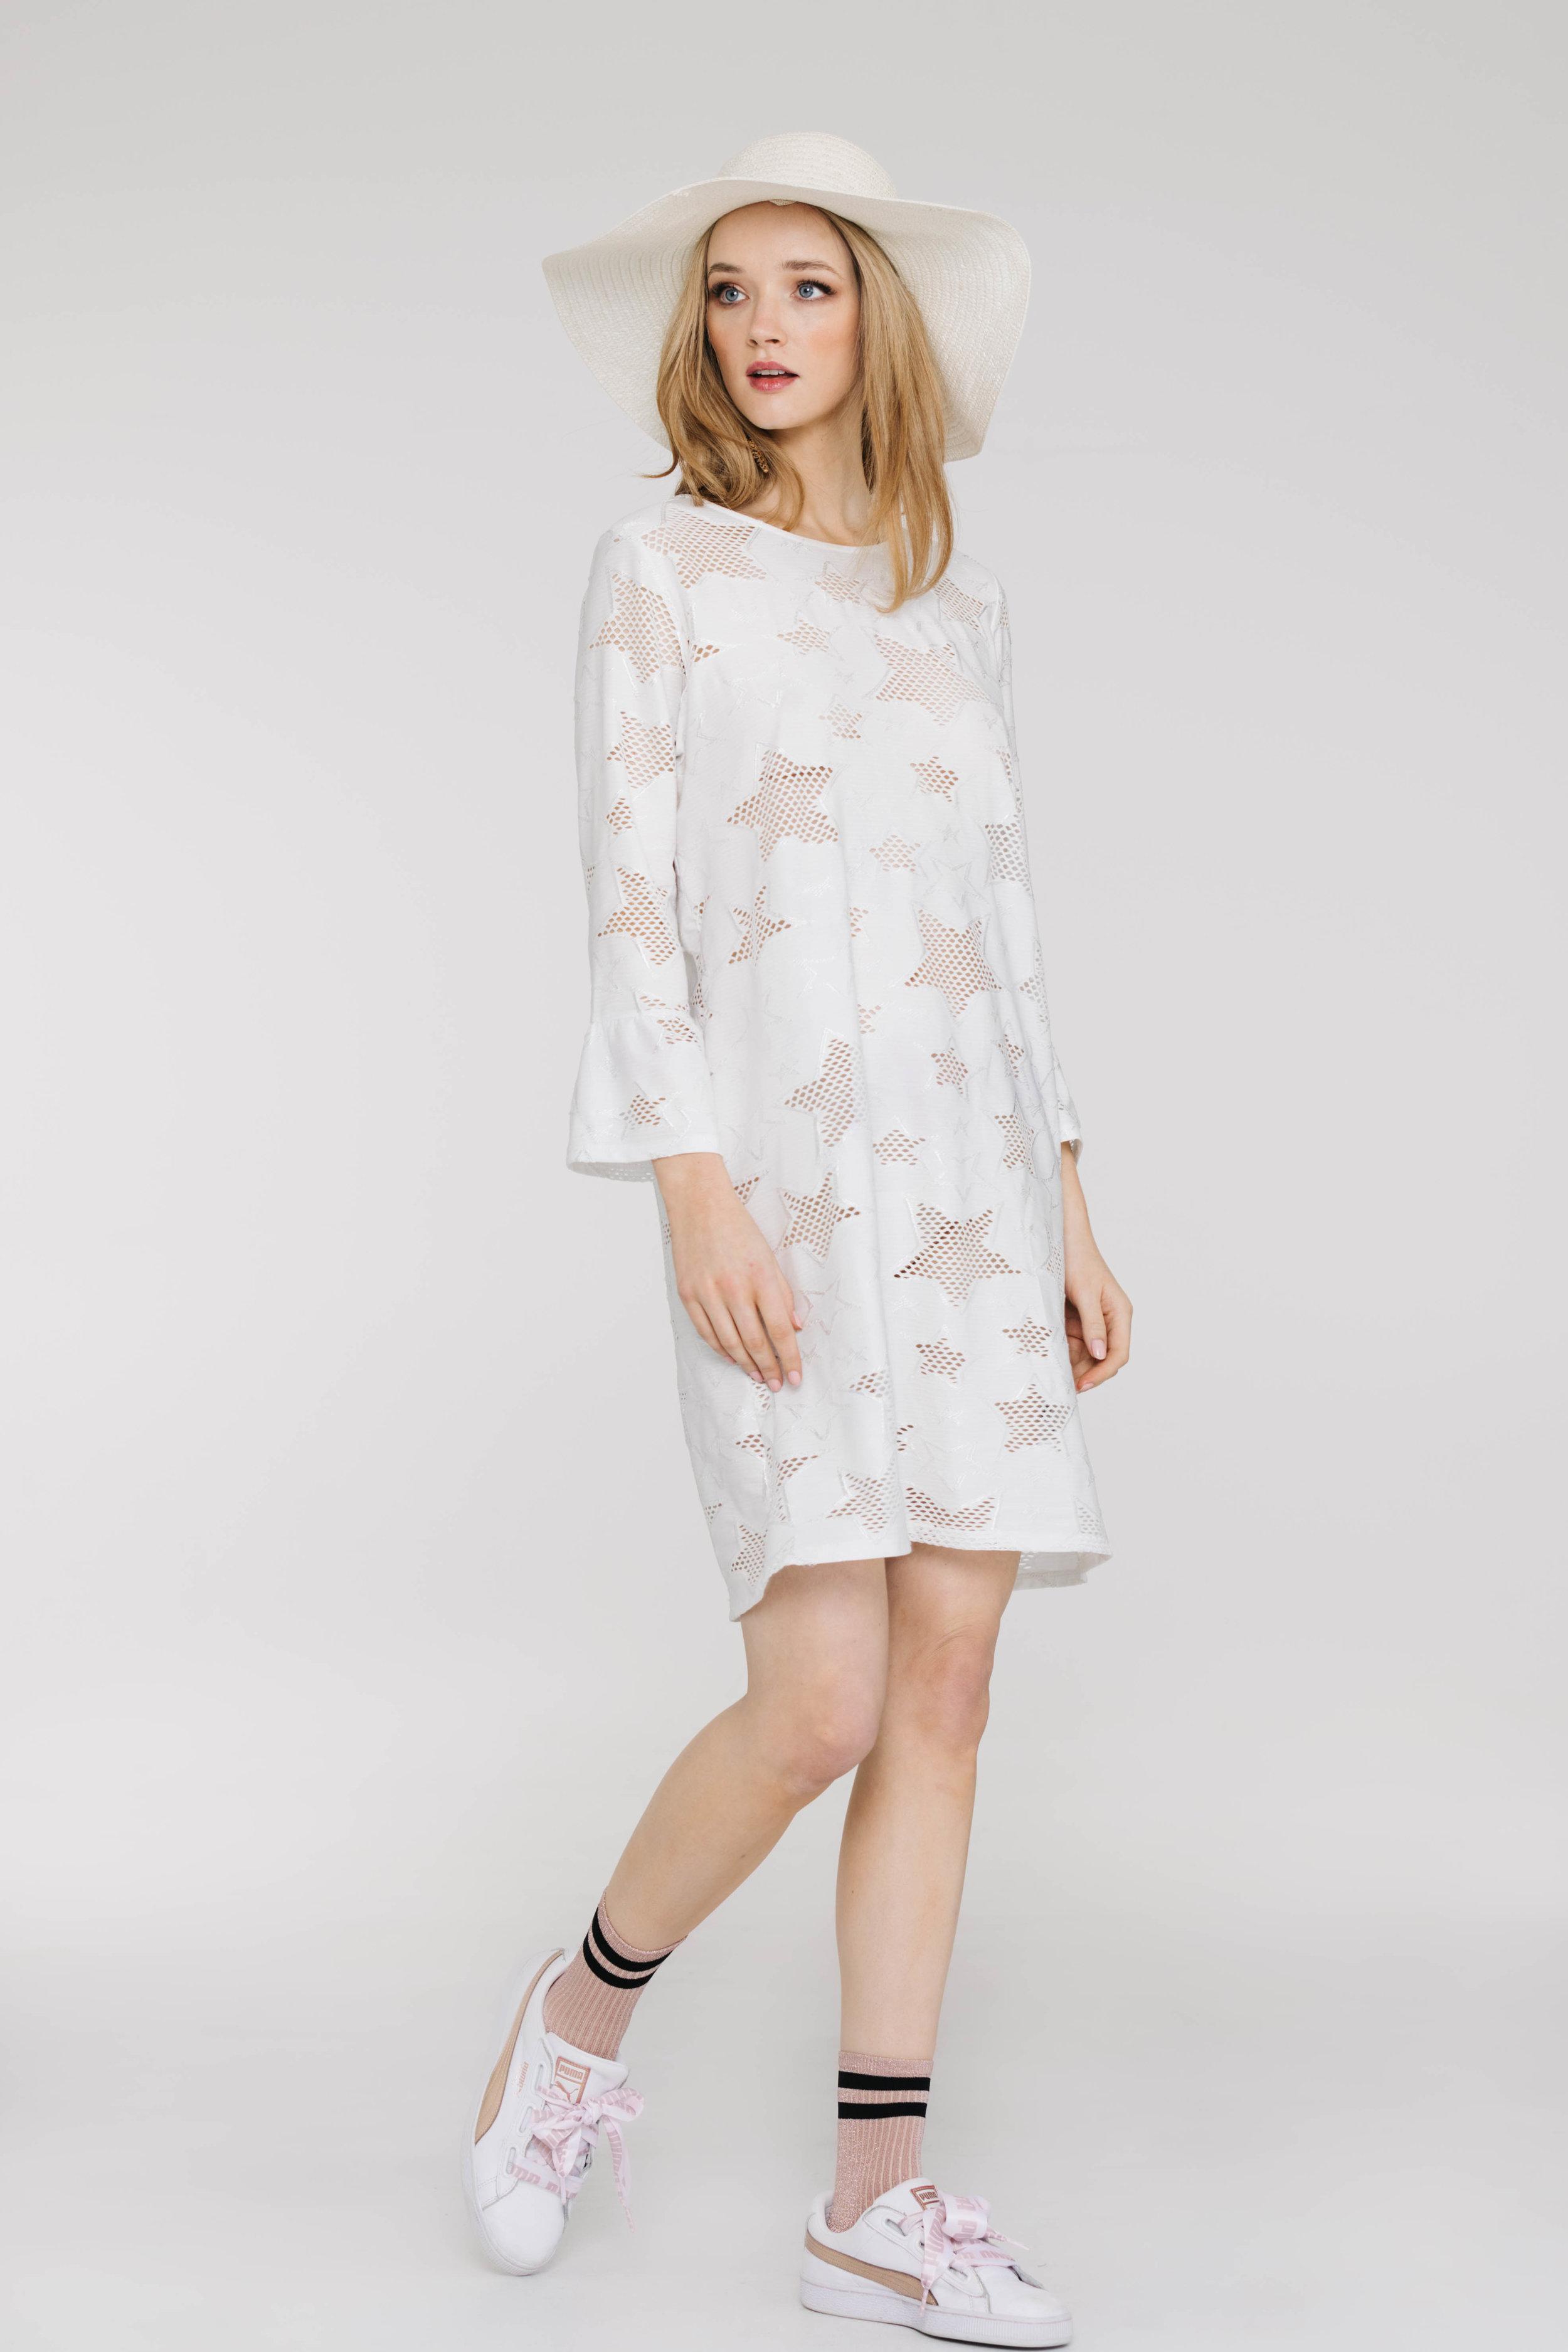 Elianna Dress 6261N Star Knit White